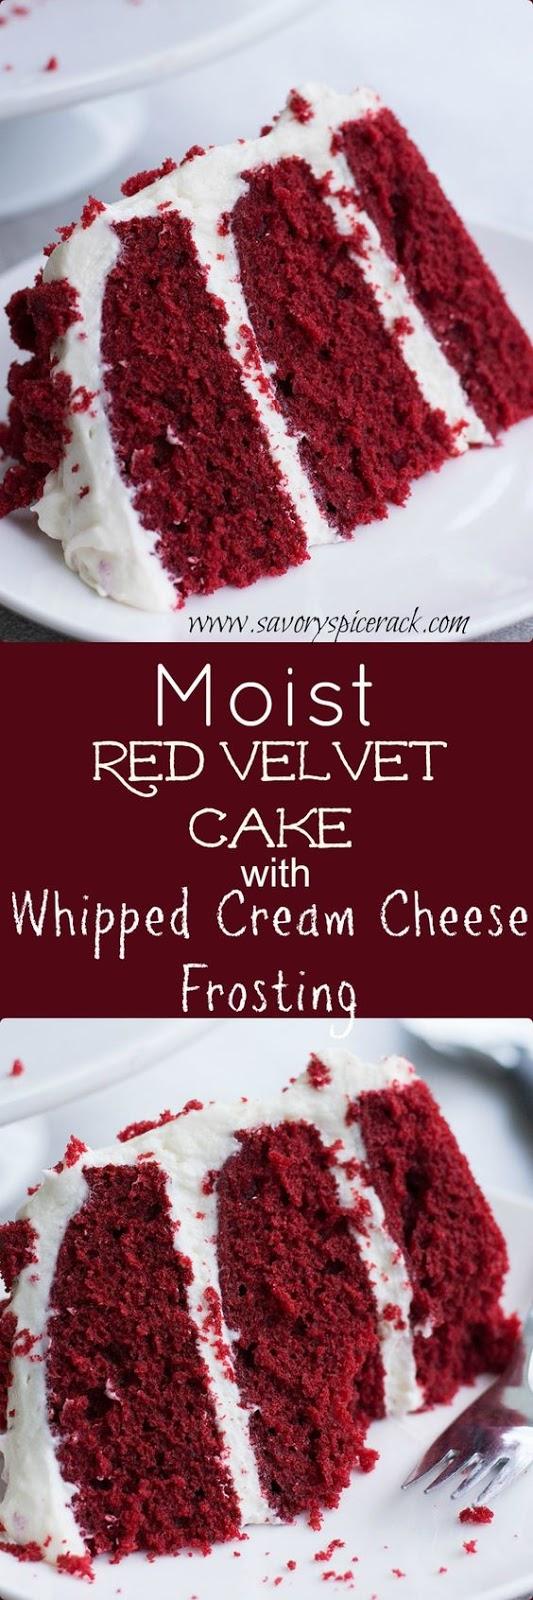 Http Www Foodnetwork Com Recipes Southern Red Velvet Cake Recipe